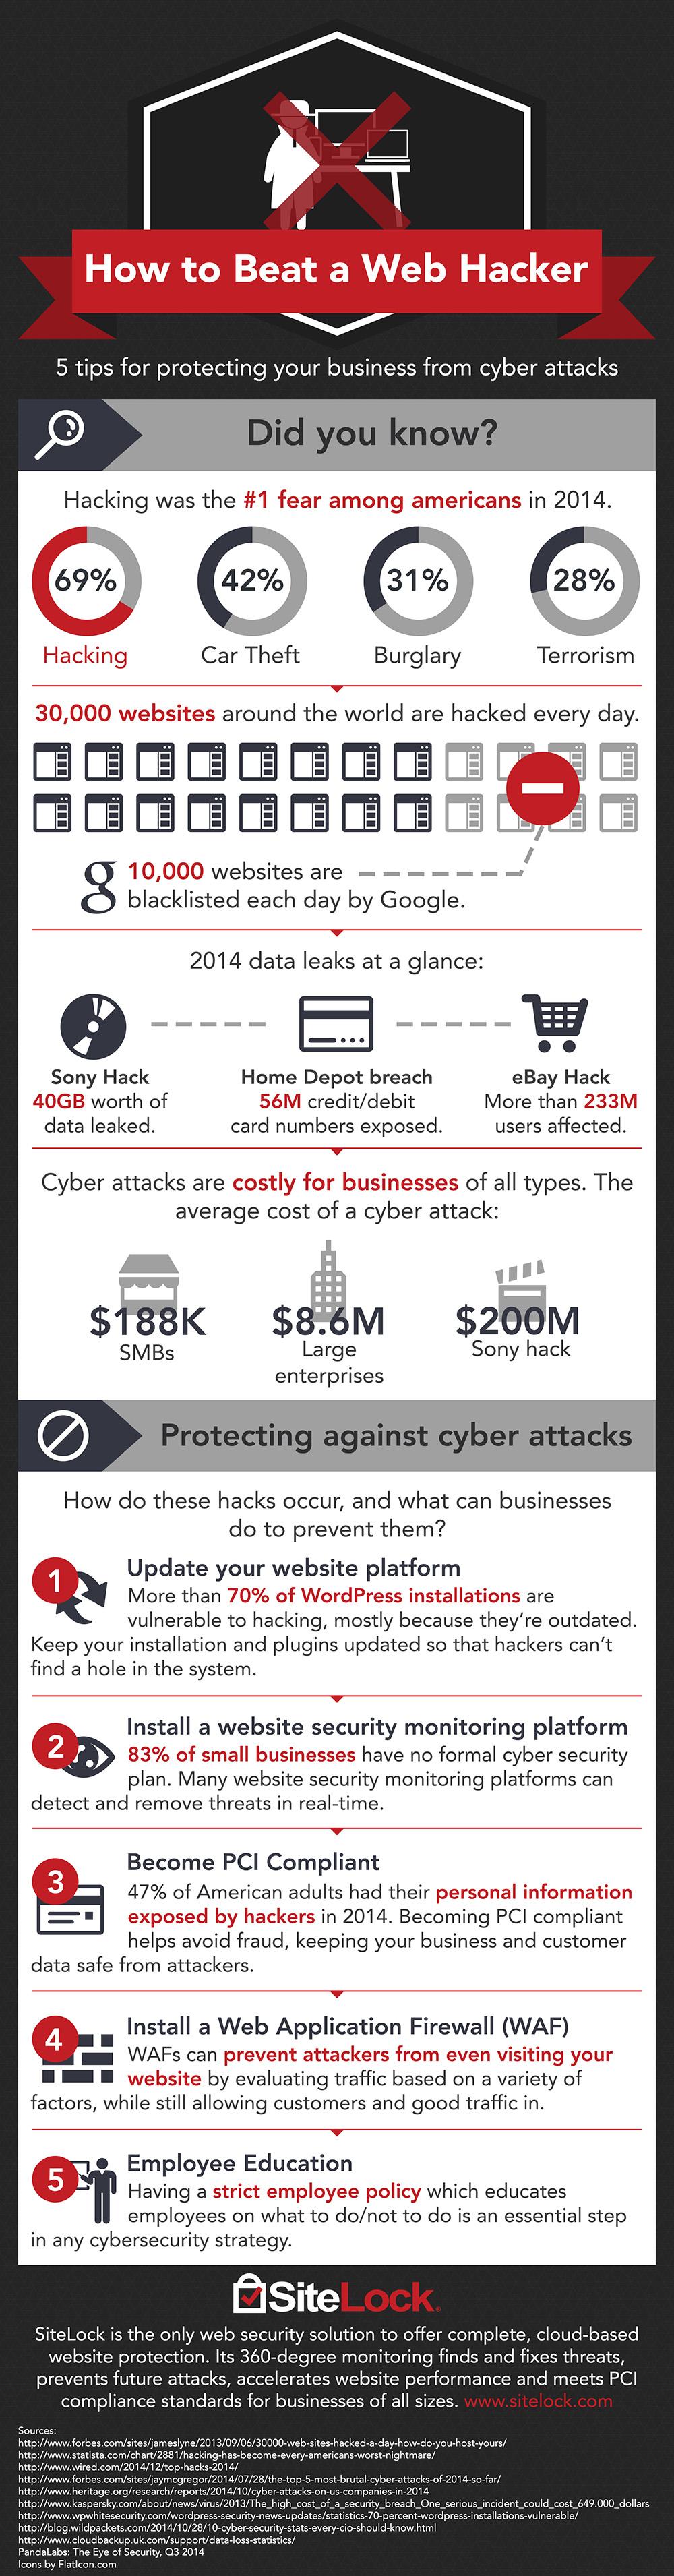 SiteLock-HowToBeatAWebHacker-Infographic-v6_s